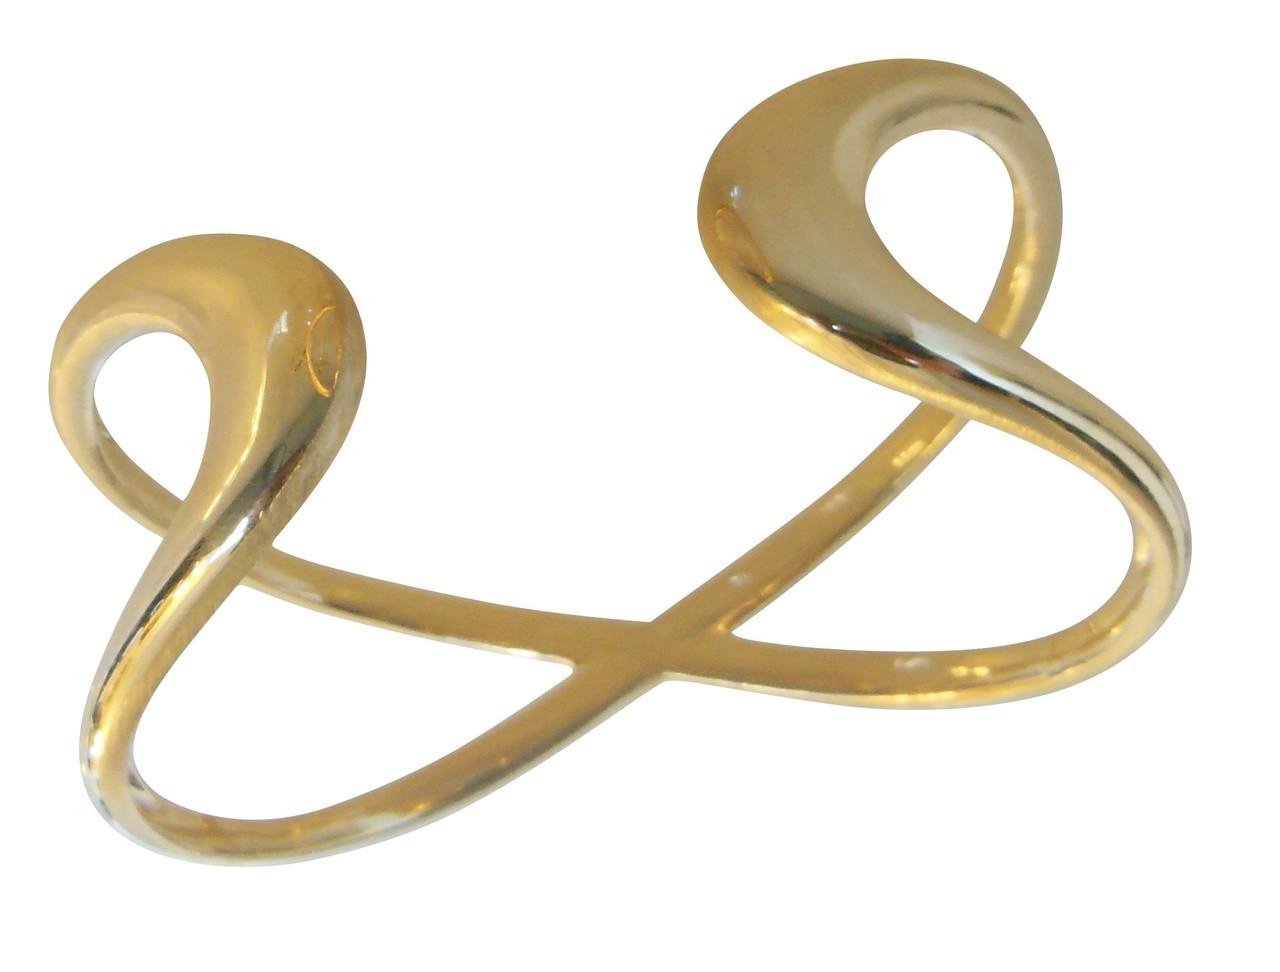 Infinity Cuff Bracelet- 14K gold